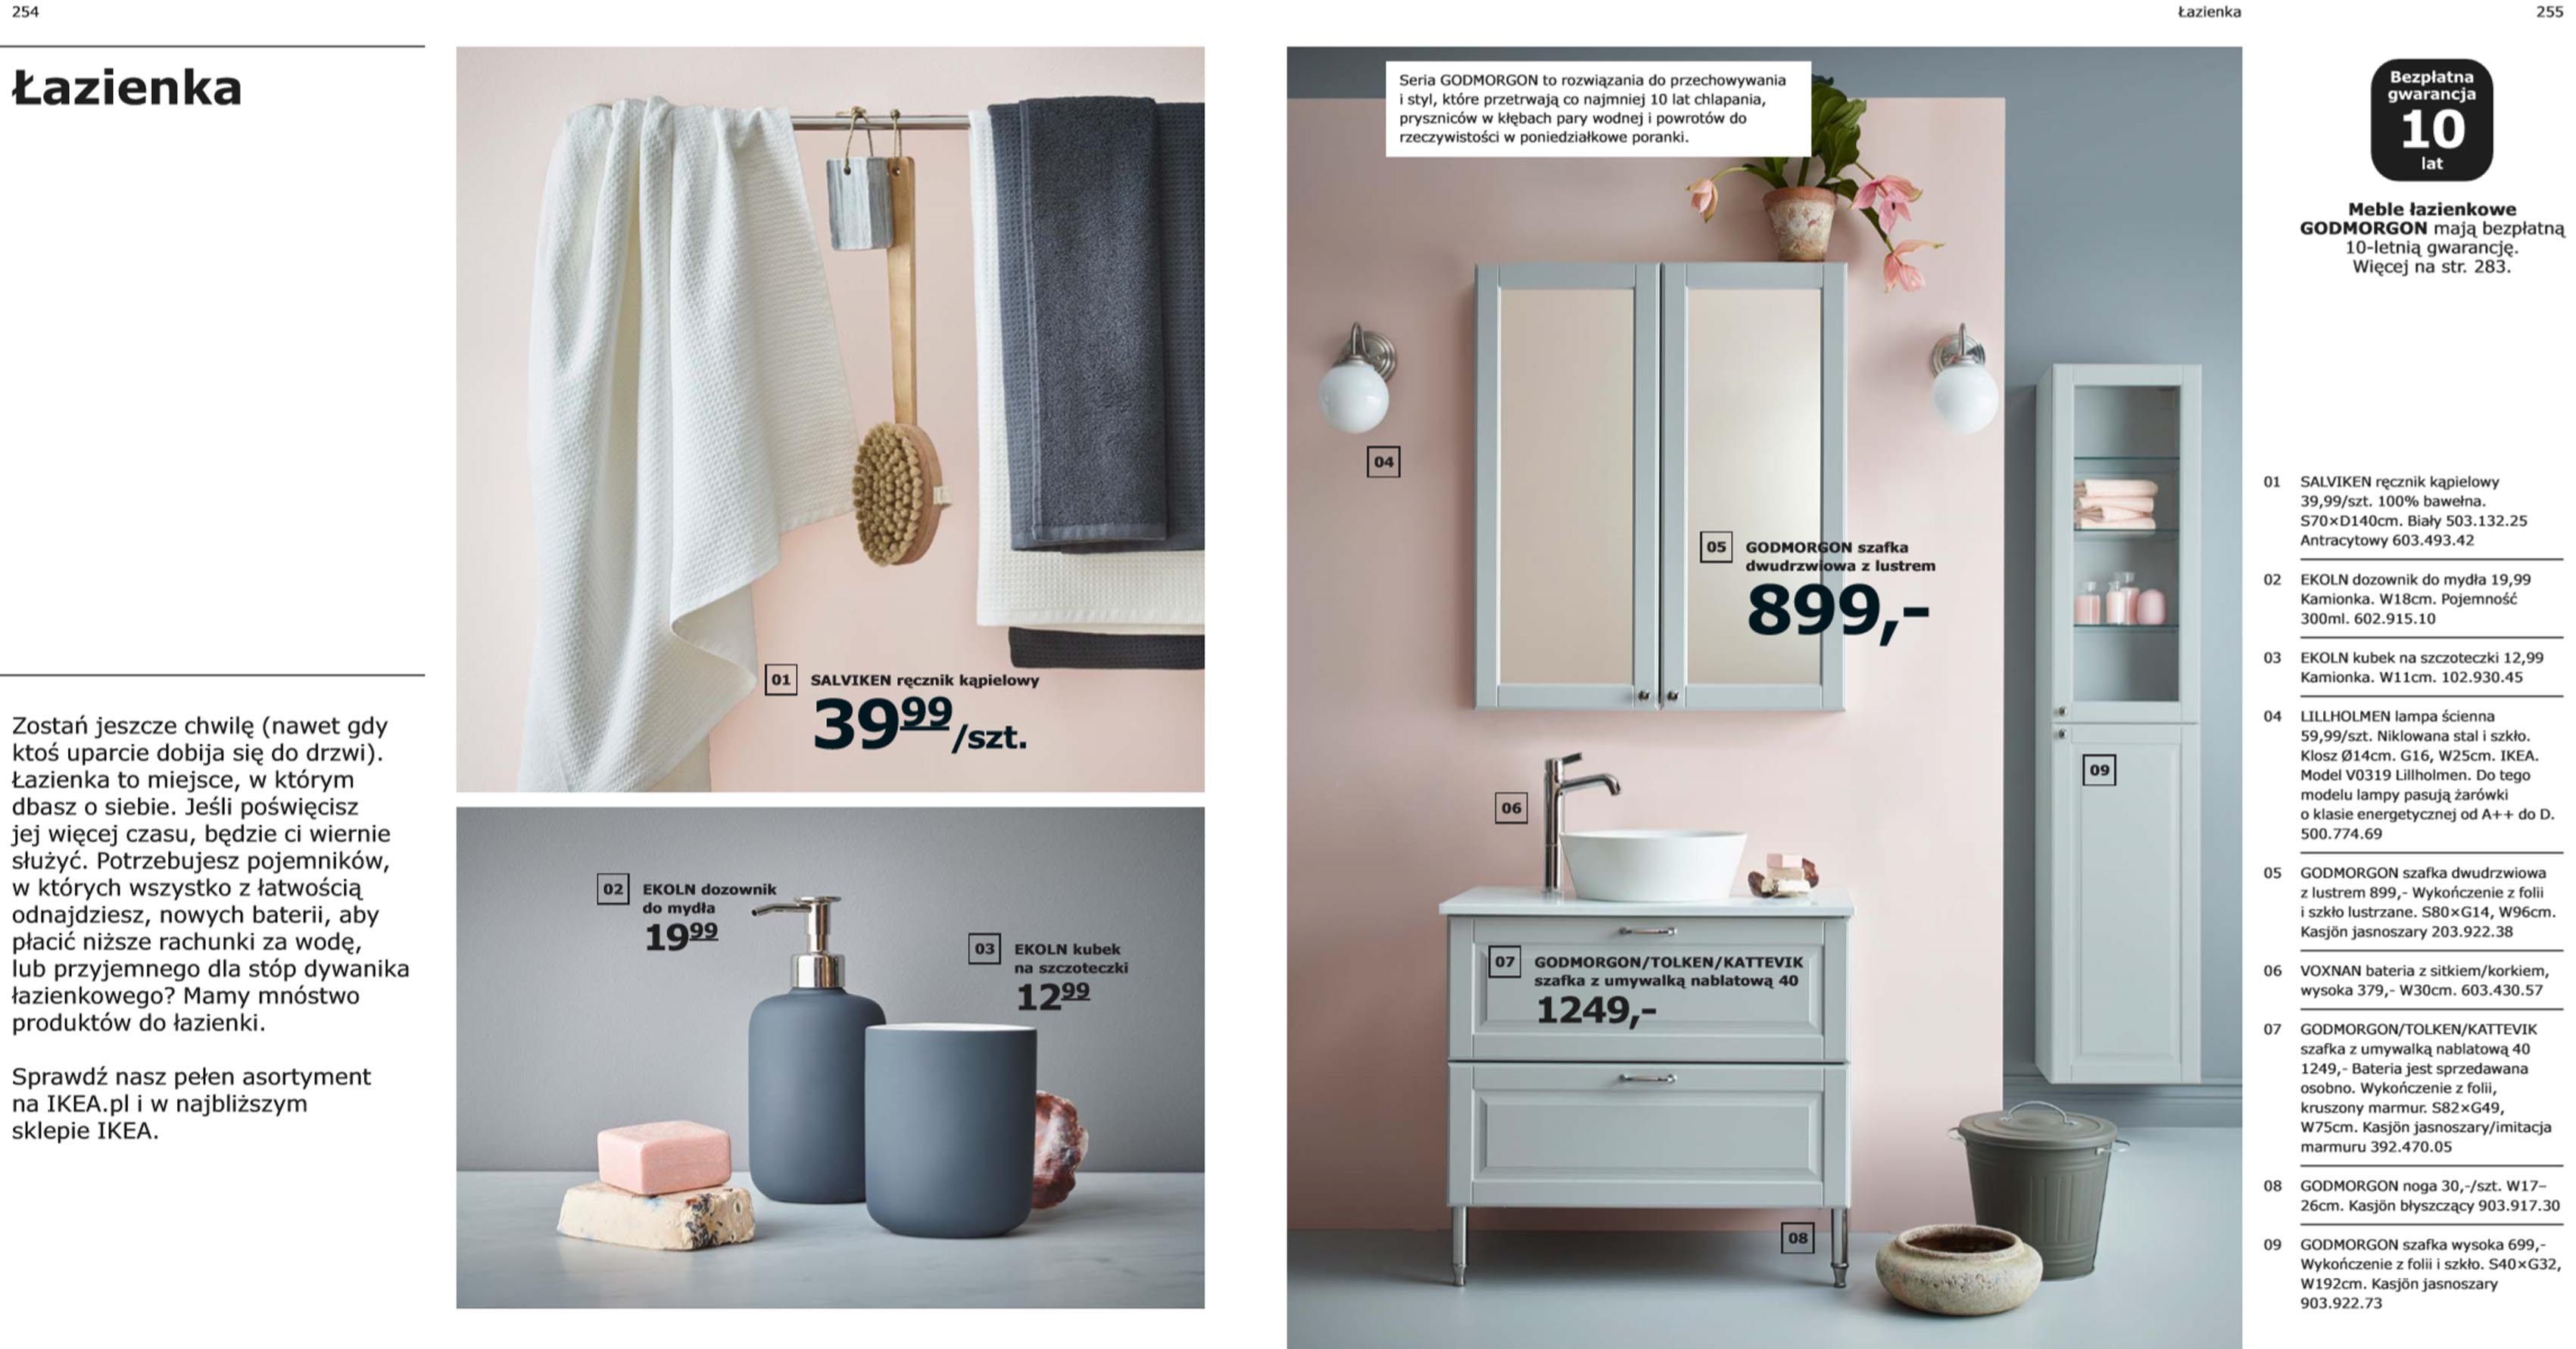 katalog ikea 2019 czyli uk on w kierunku vintage archistacja pl. Black Bedroom Furniture Sets. Home Design Ideas